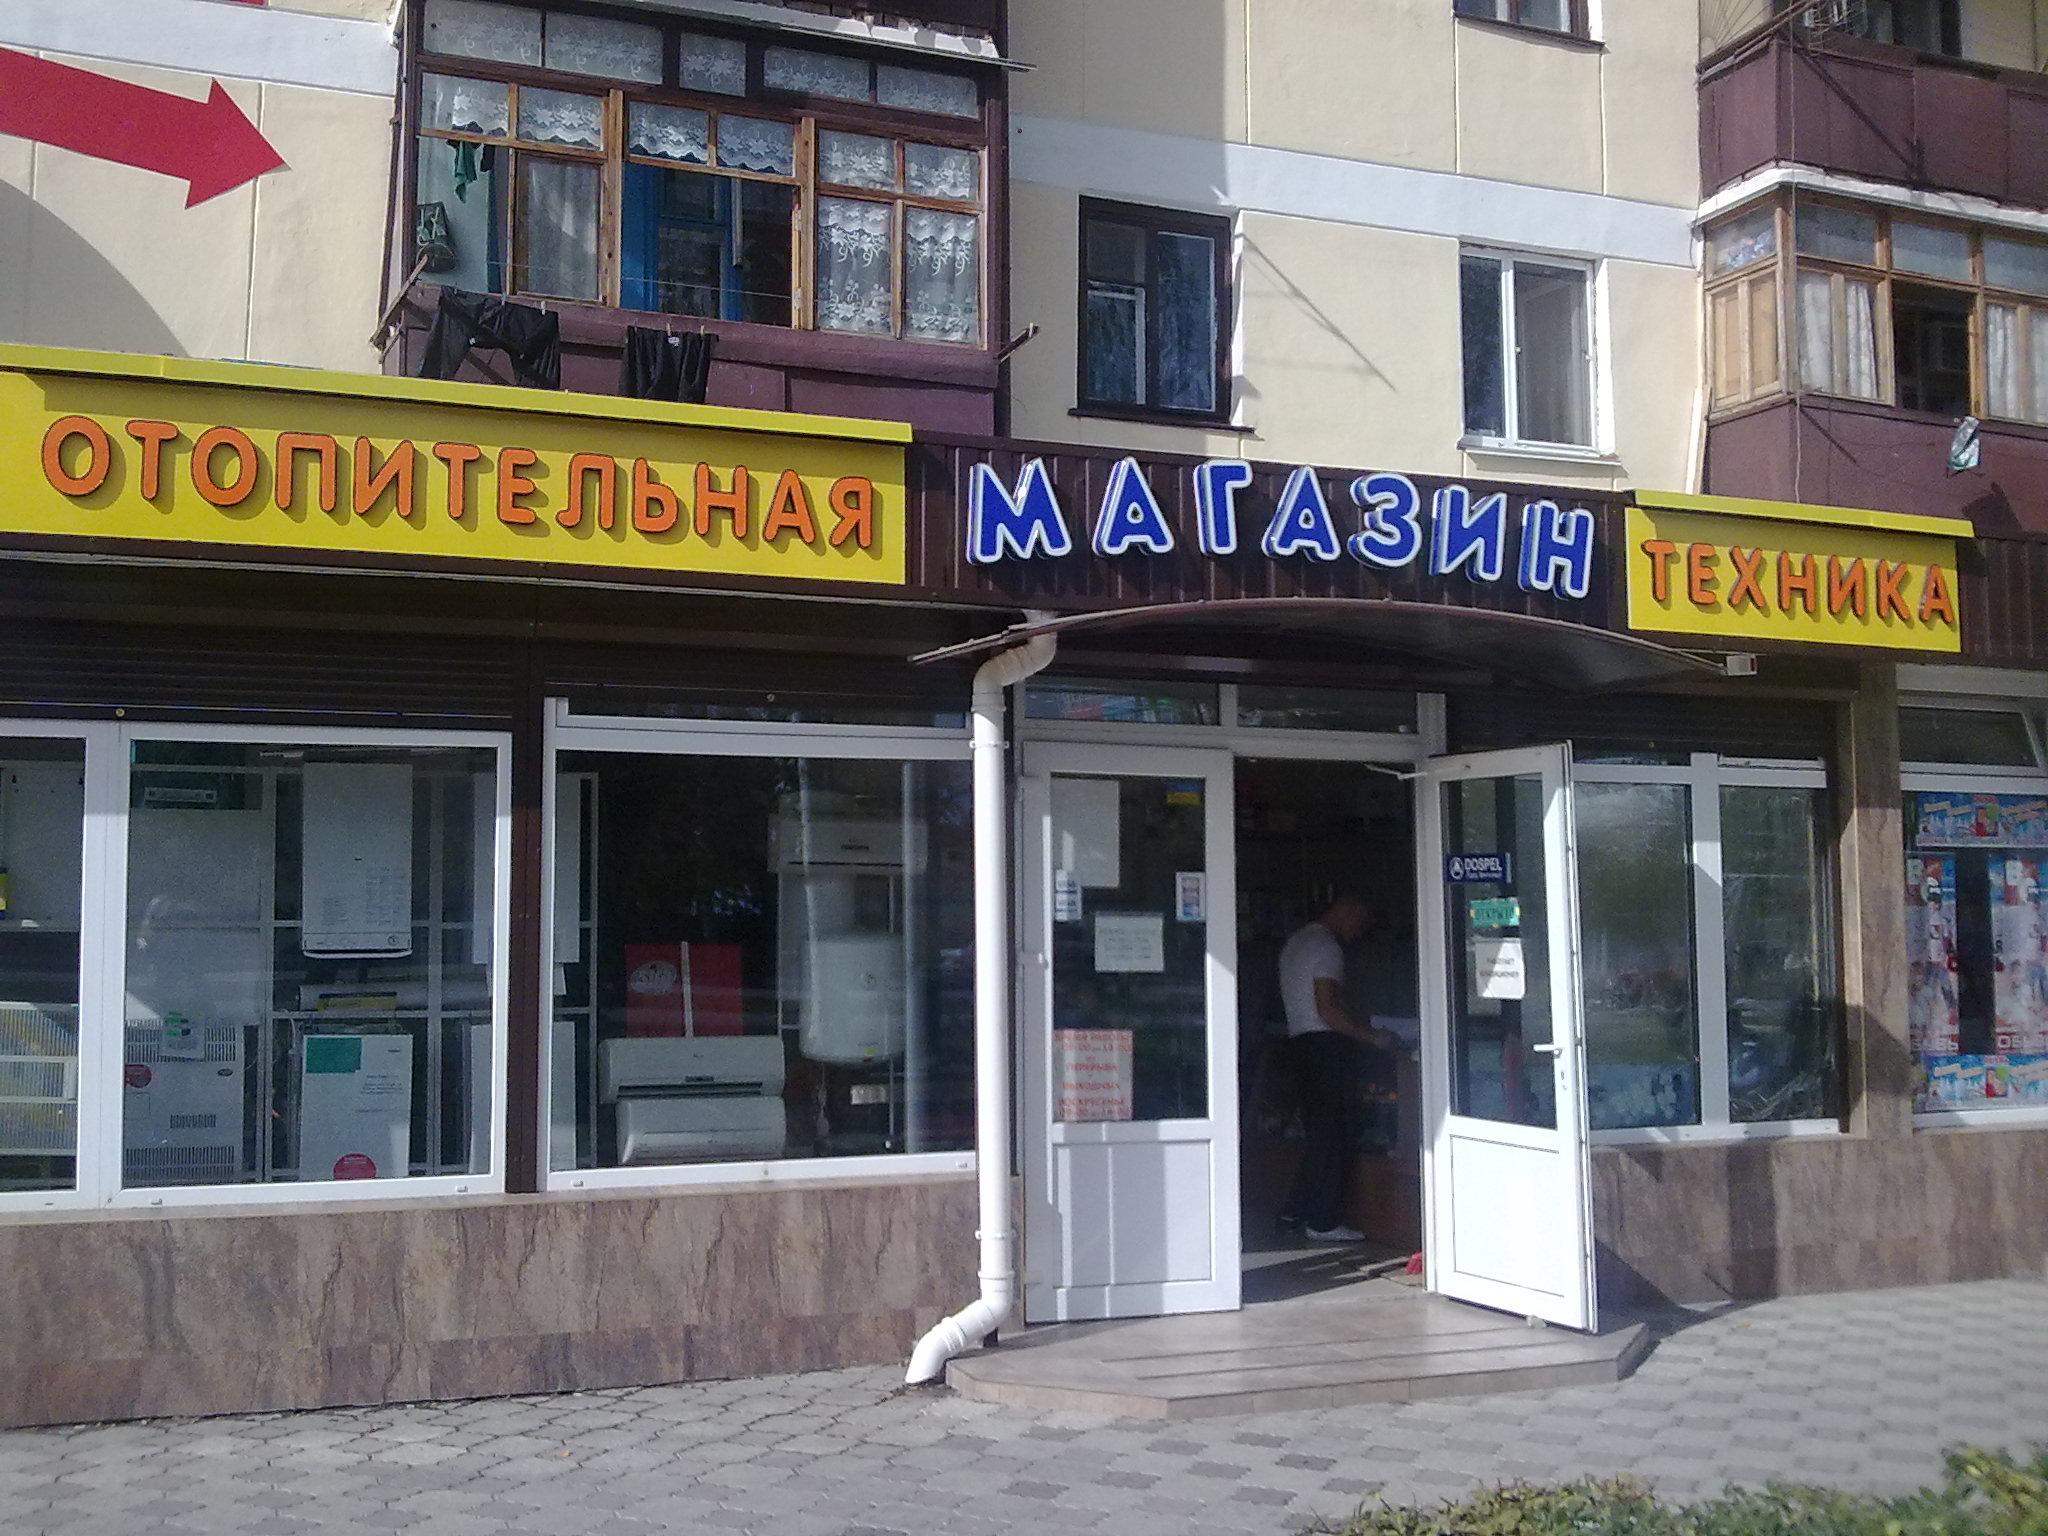 Газоотопительная техника, Магазин ИП Шамраев А.И логотип